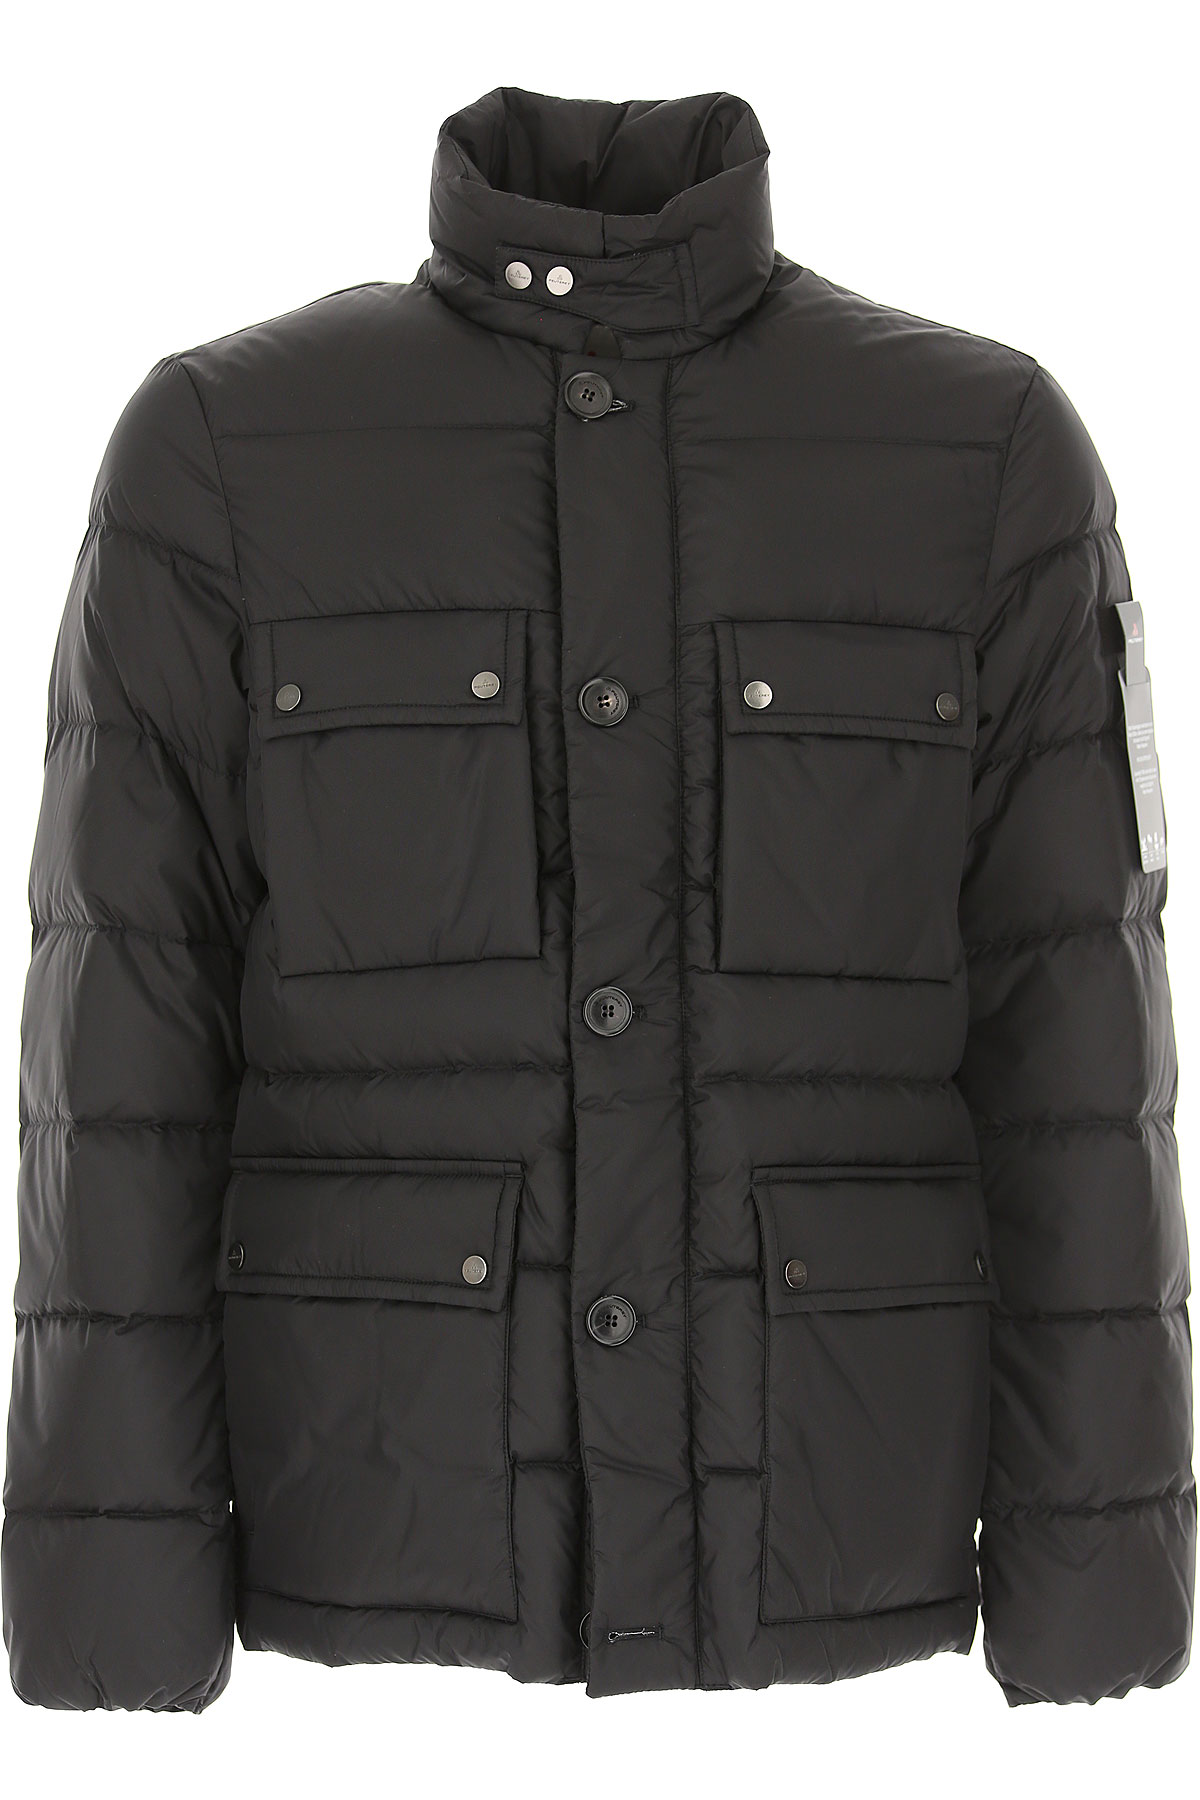 Image of Peuterey Down Jacket for Men, Puffer Ski Jacket, Black, polyamide, 2017, L M